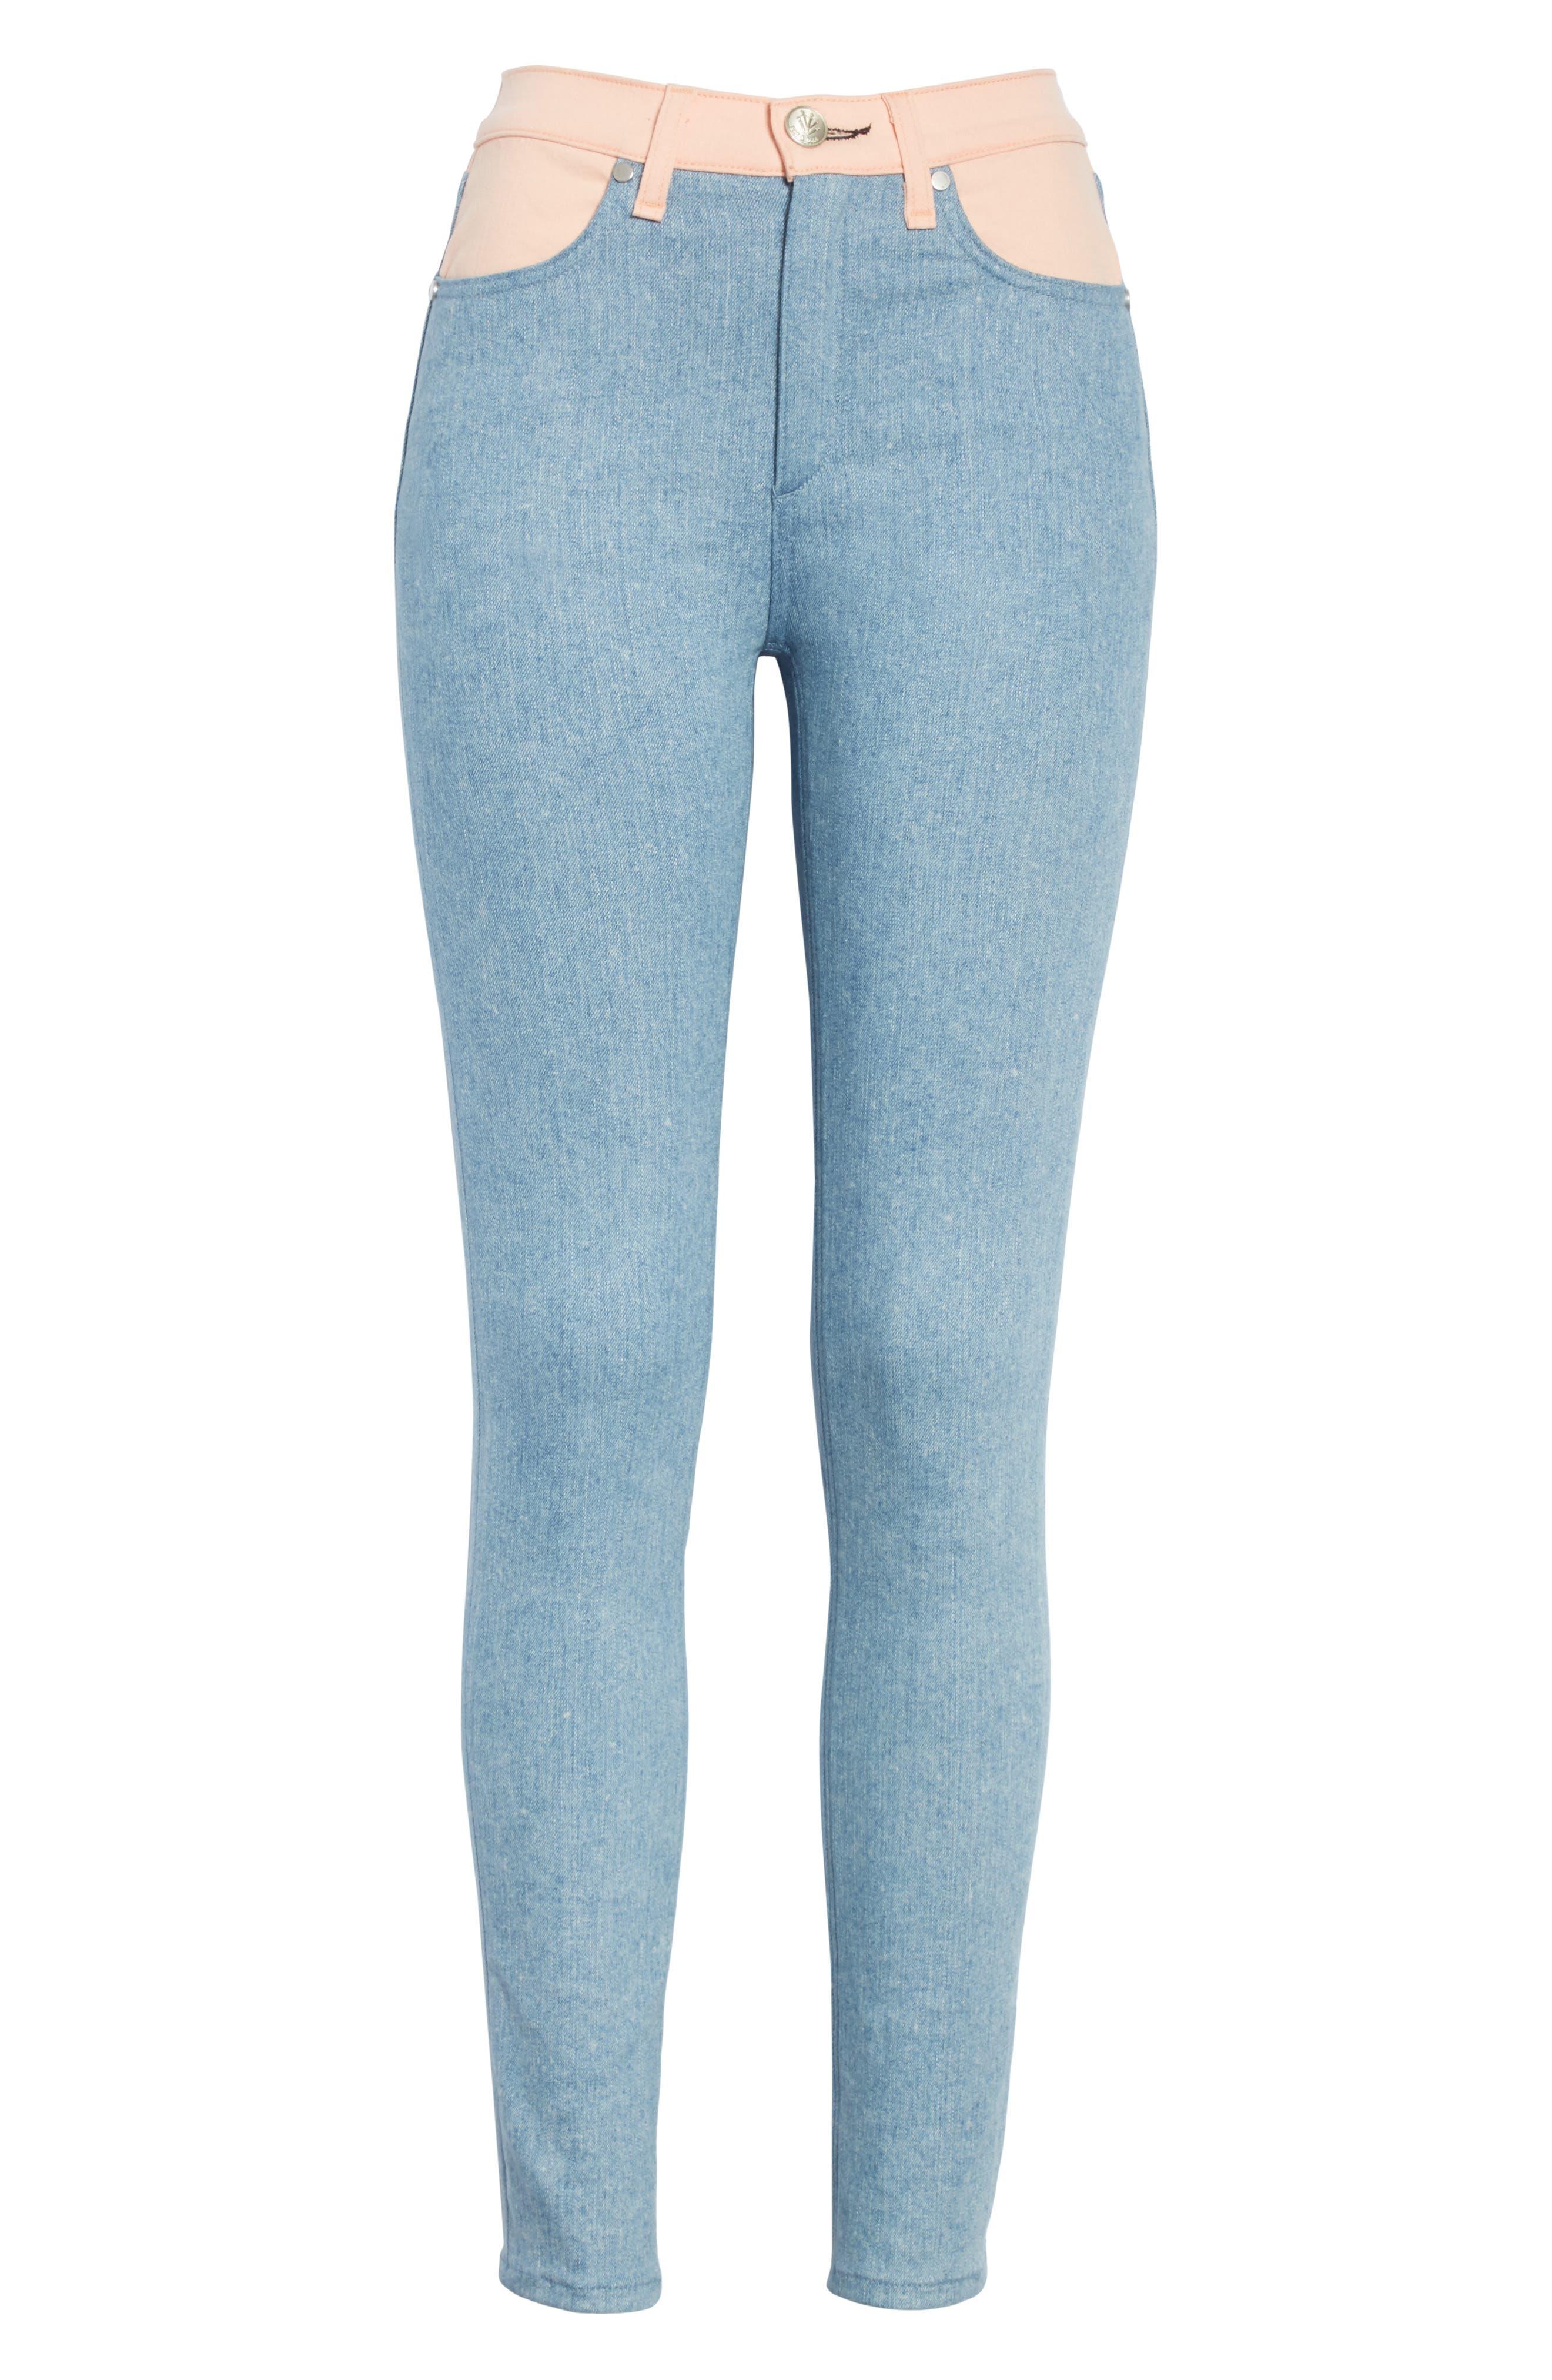 Phila Skinny Jeans,                             Alternate thumbnail 6, color,                             450